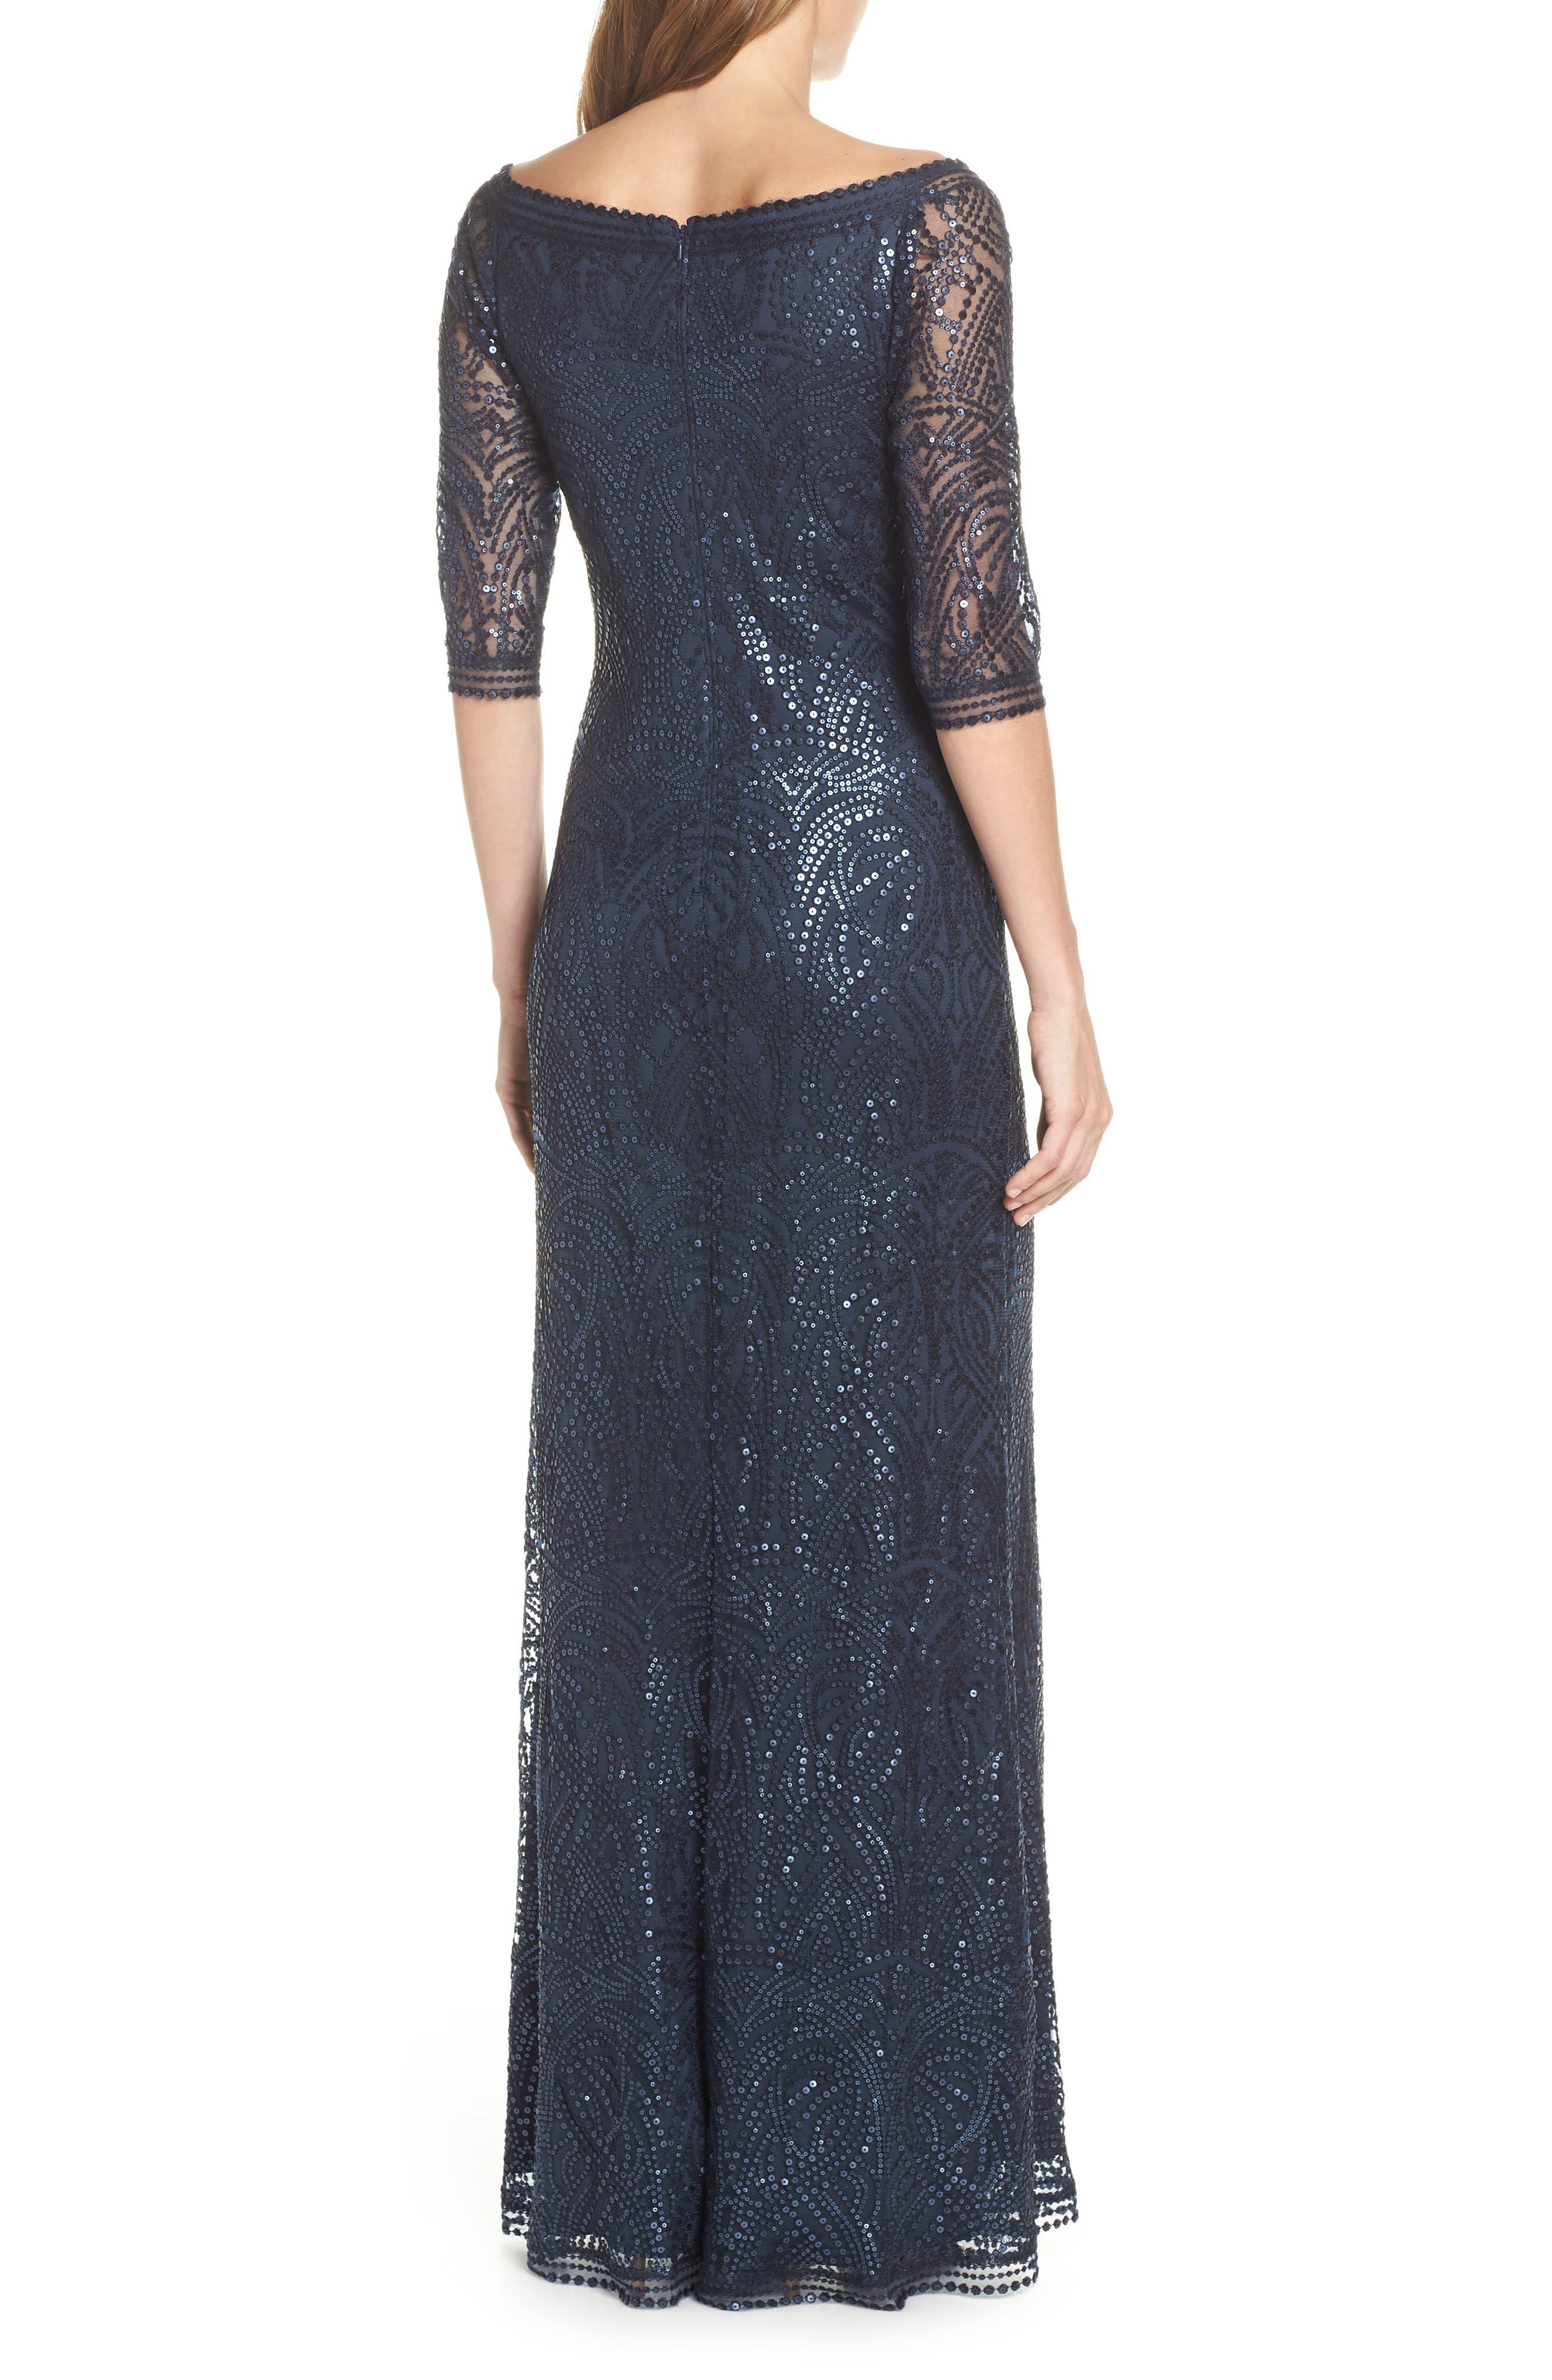 TADASHI SHOJI, Sequin Off the Shoulder Evening Dress, Alternate thumbnail 2, color, 410